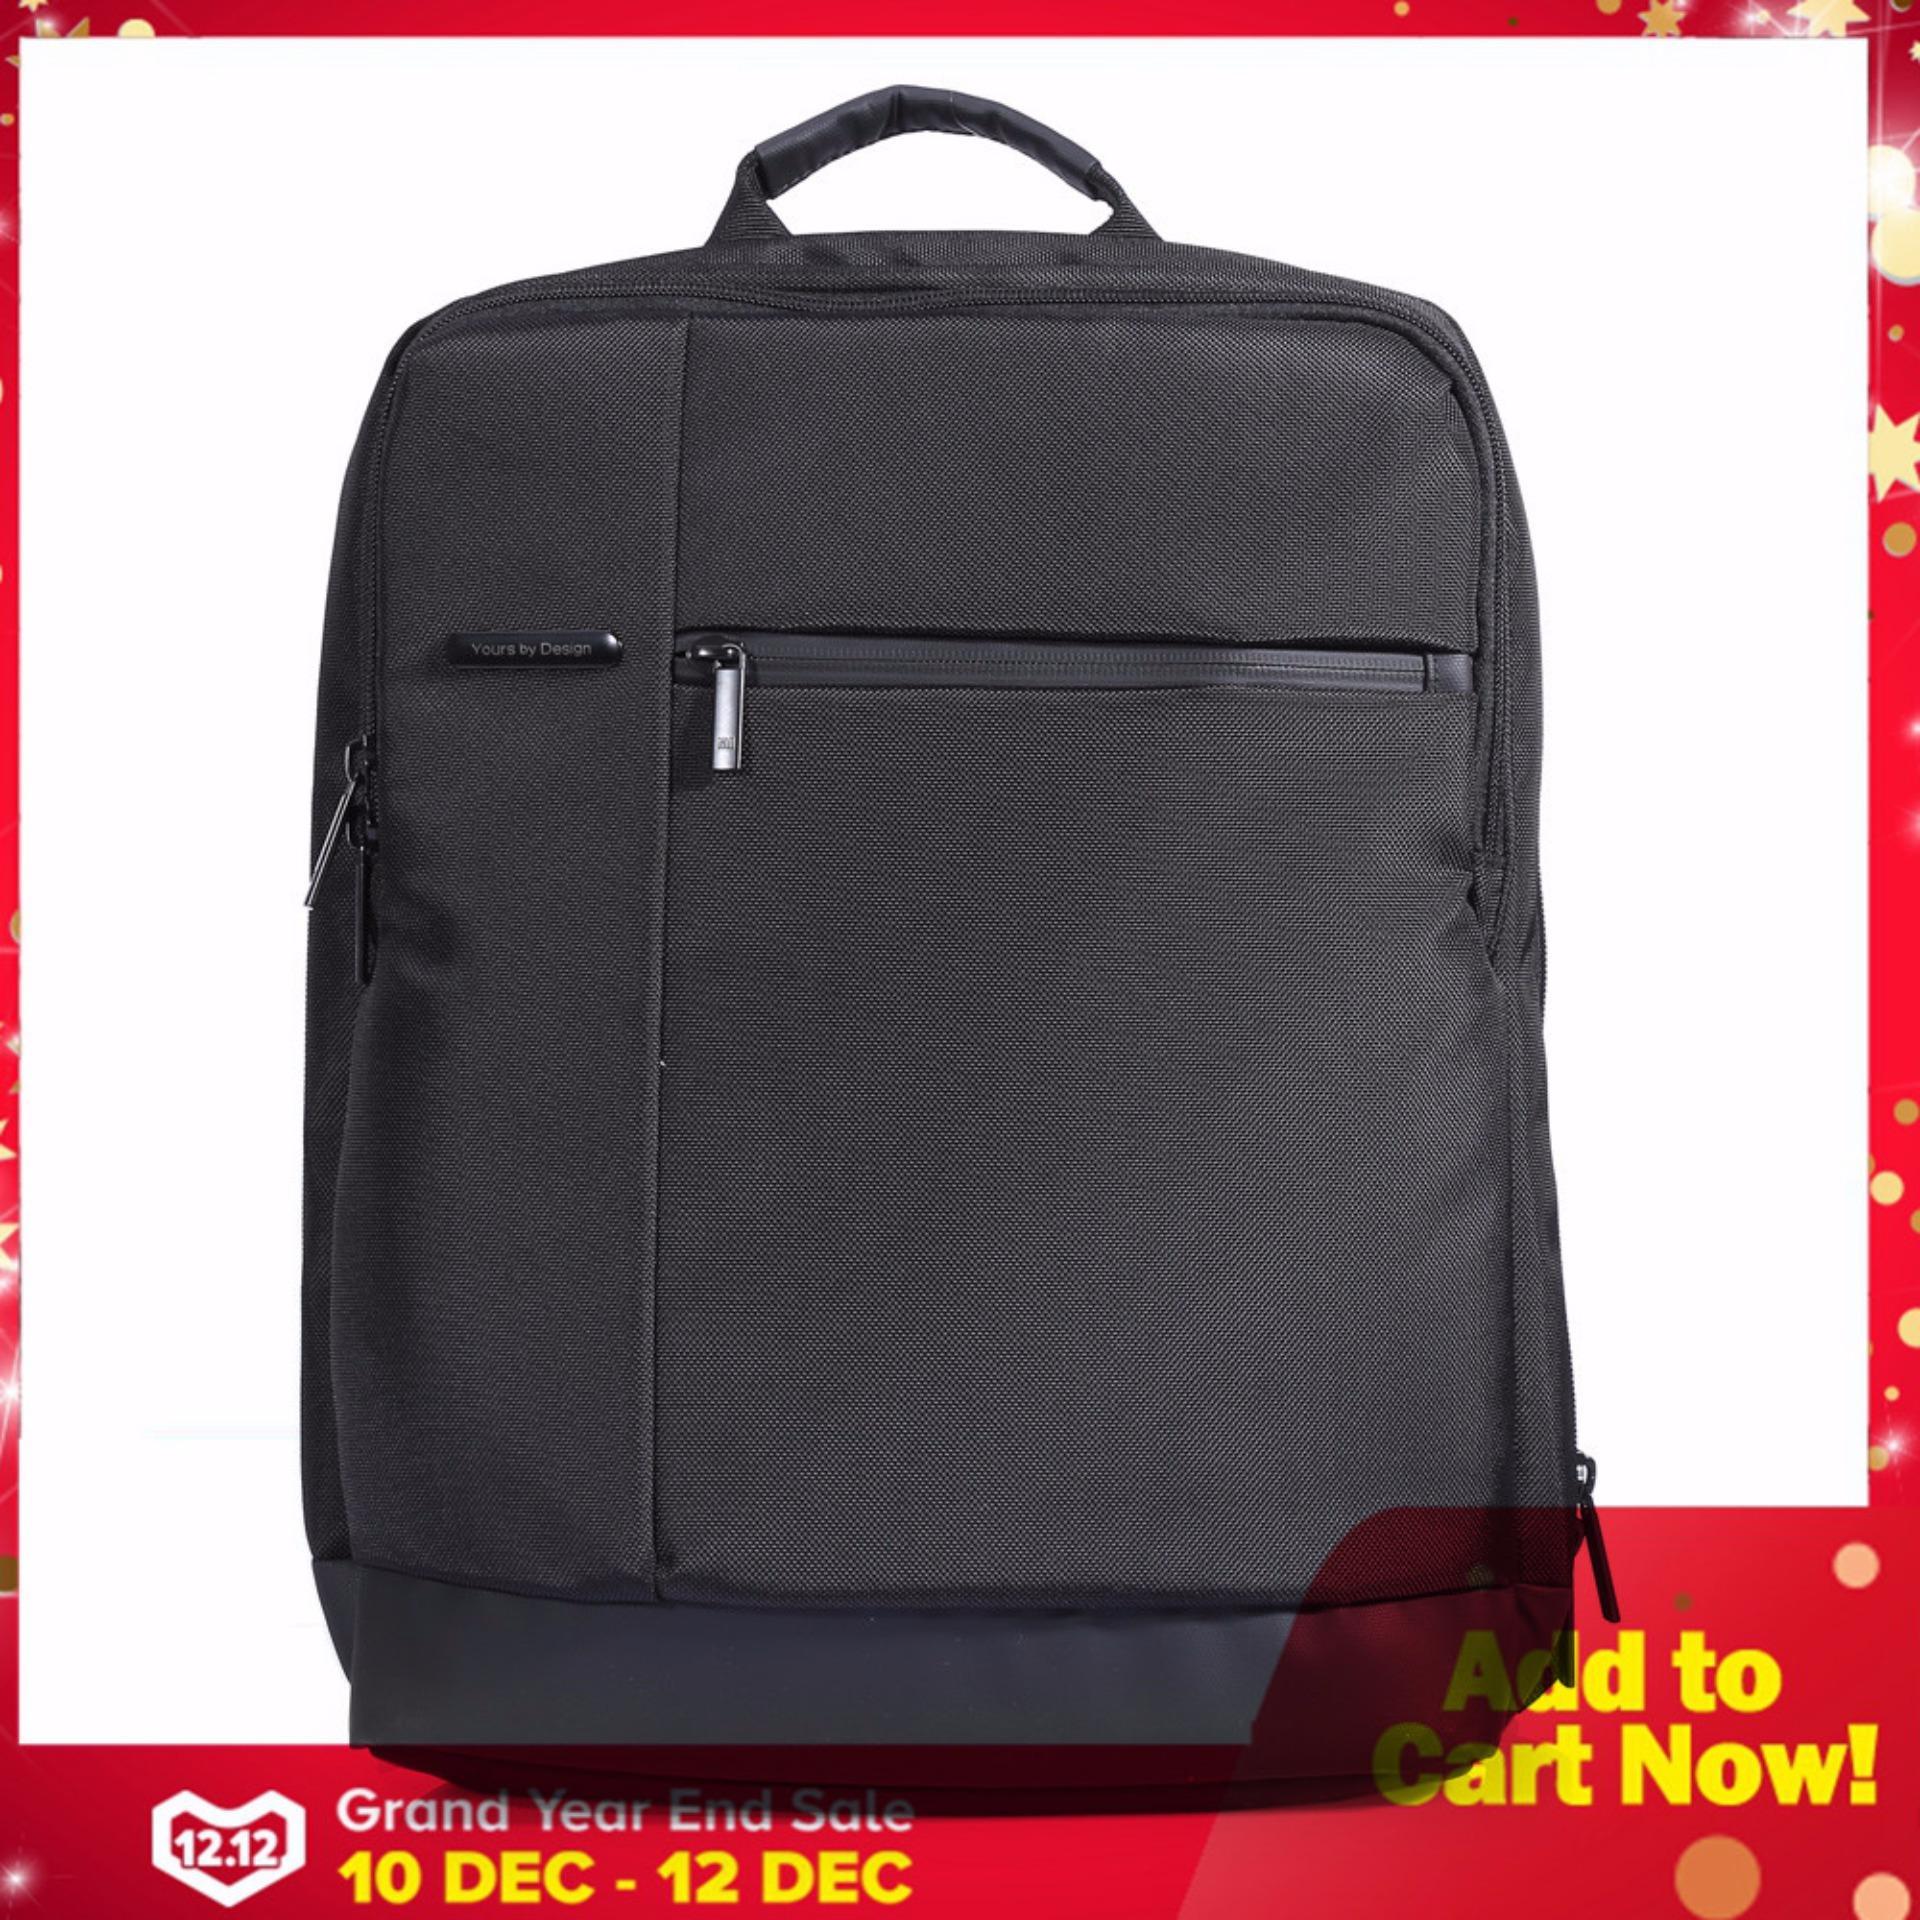 Slate Grey, Model SA1753 SwissGear Backpack Laptop Travel Backpack ScanSmart